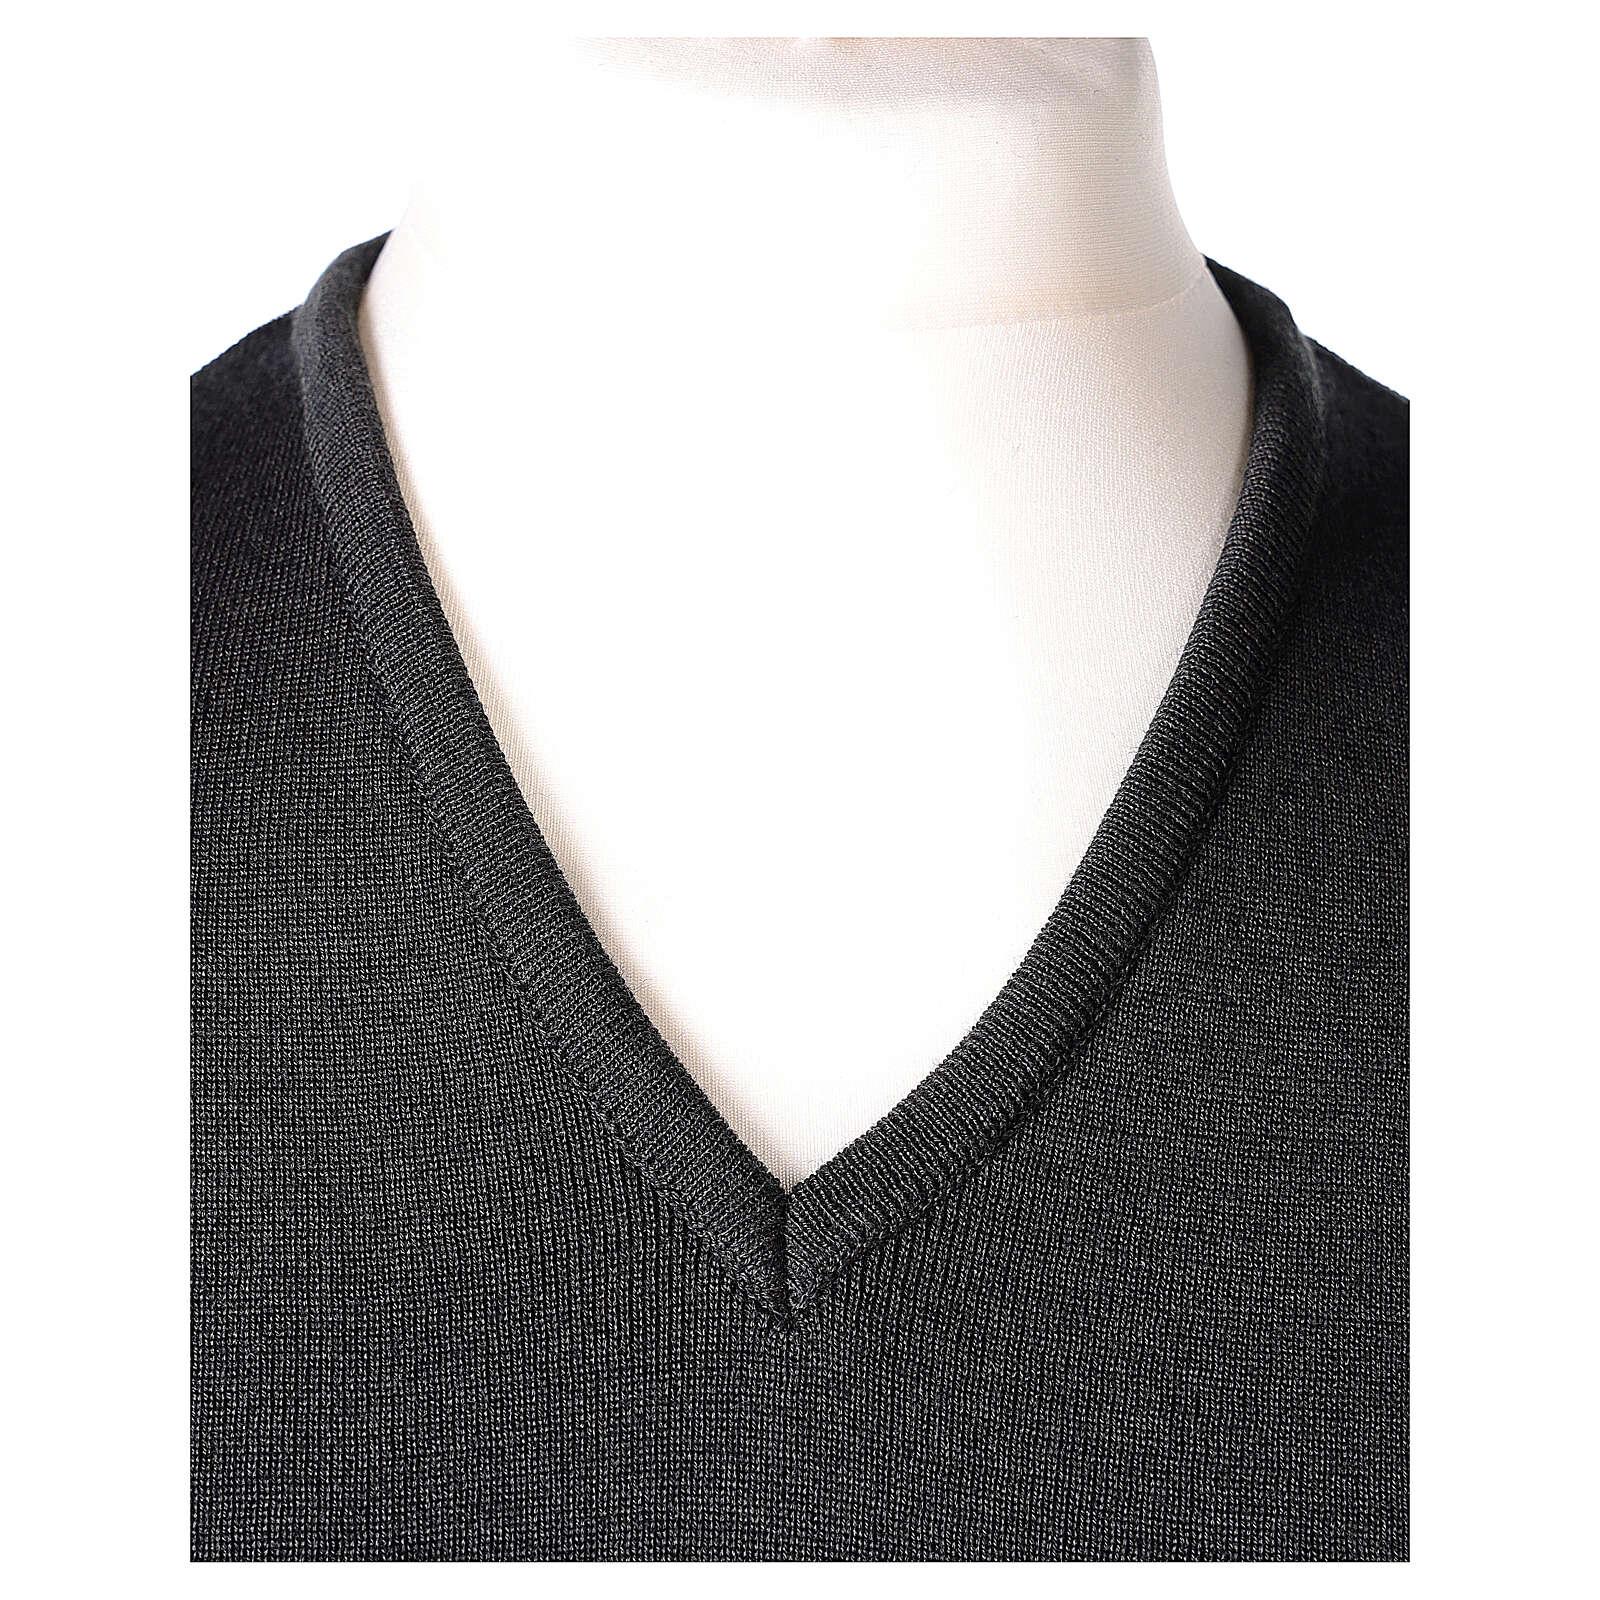 Clergy grey sleeveless jumper plain knit 50% merino wool 50% acrylic PLUS SIZES In Primis 4